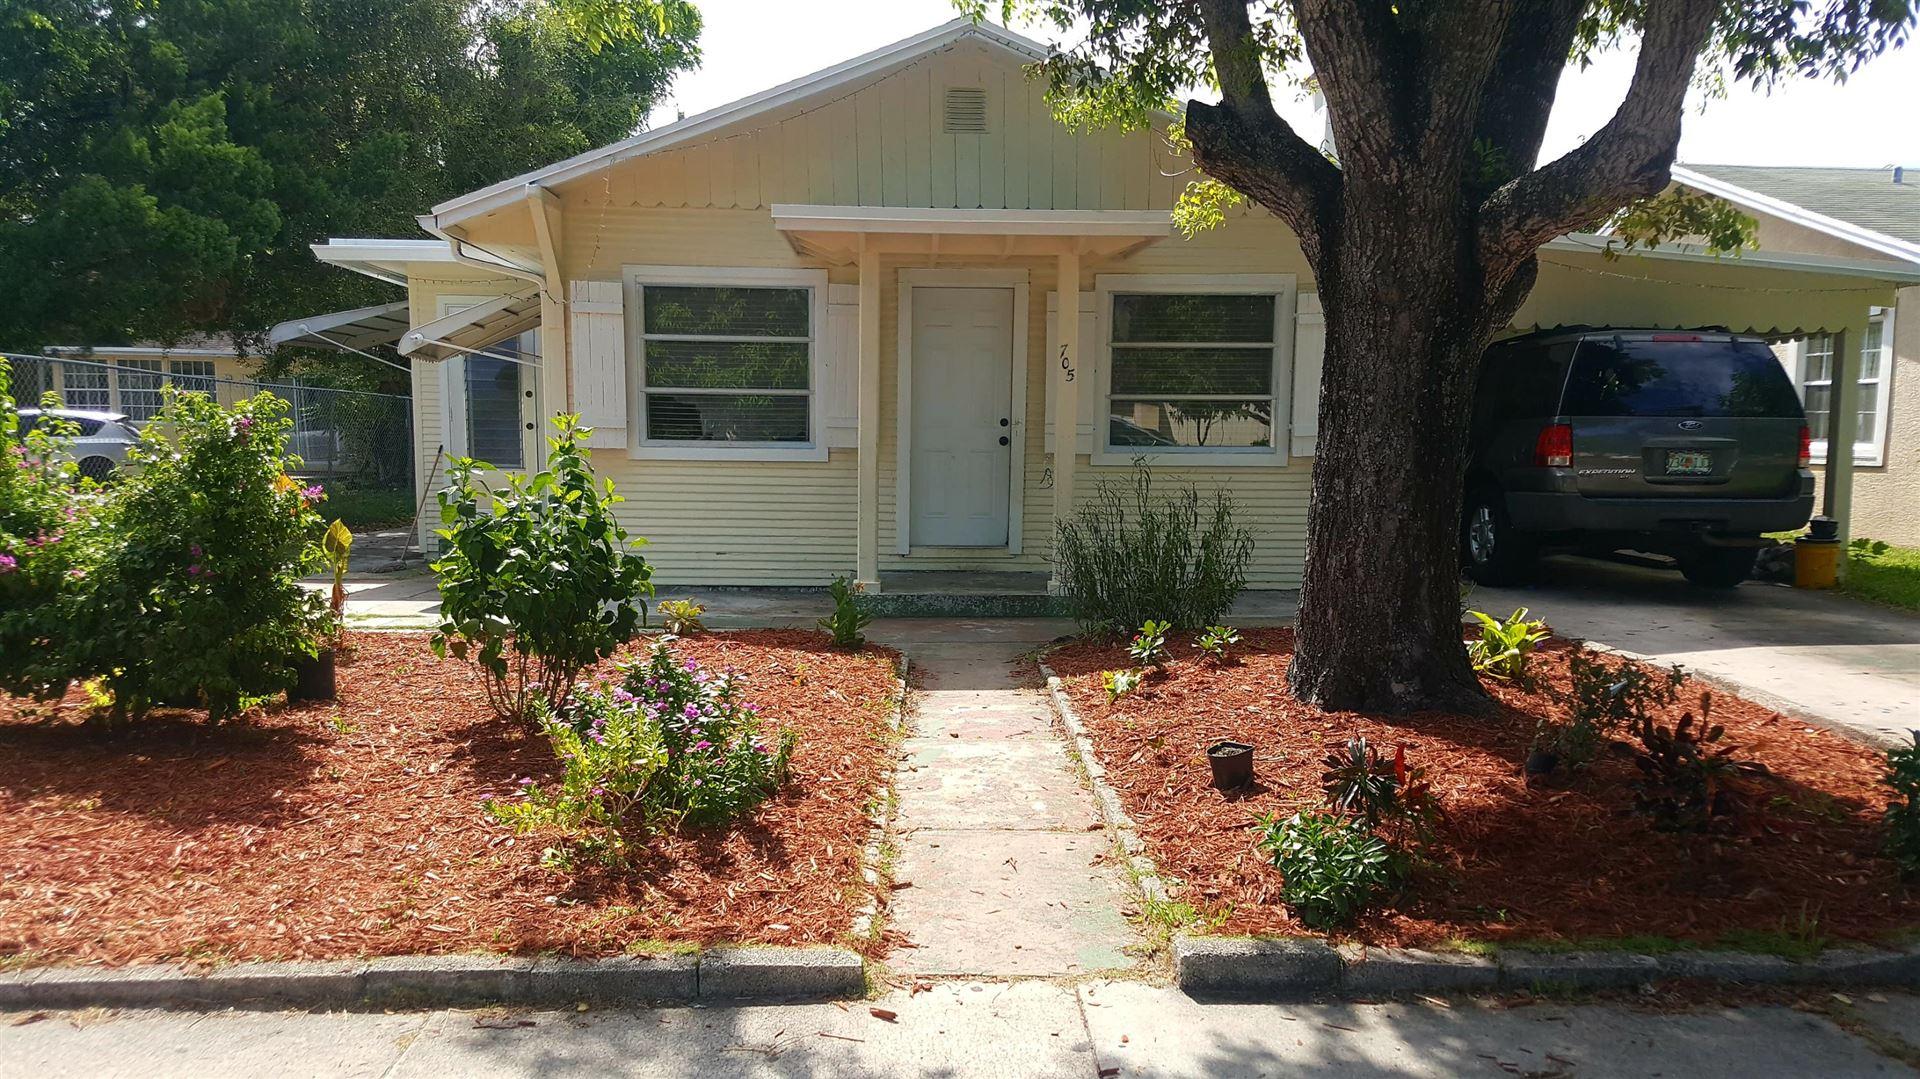 705 North C Street, Lake Worth, FL 33460 - #: RX-10652550